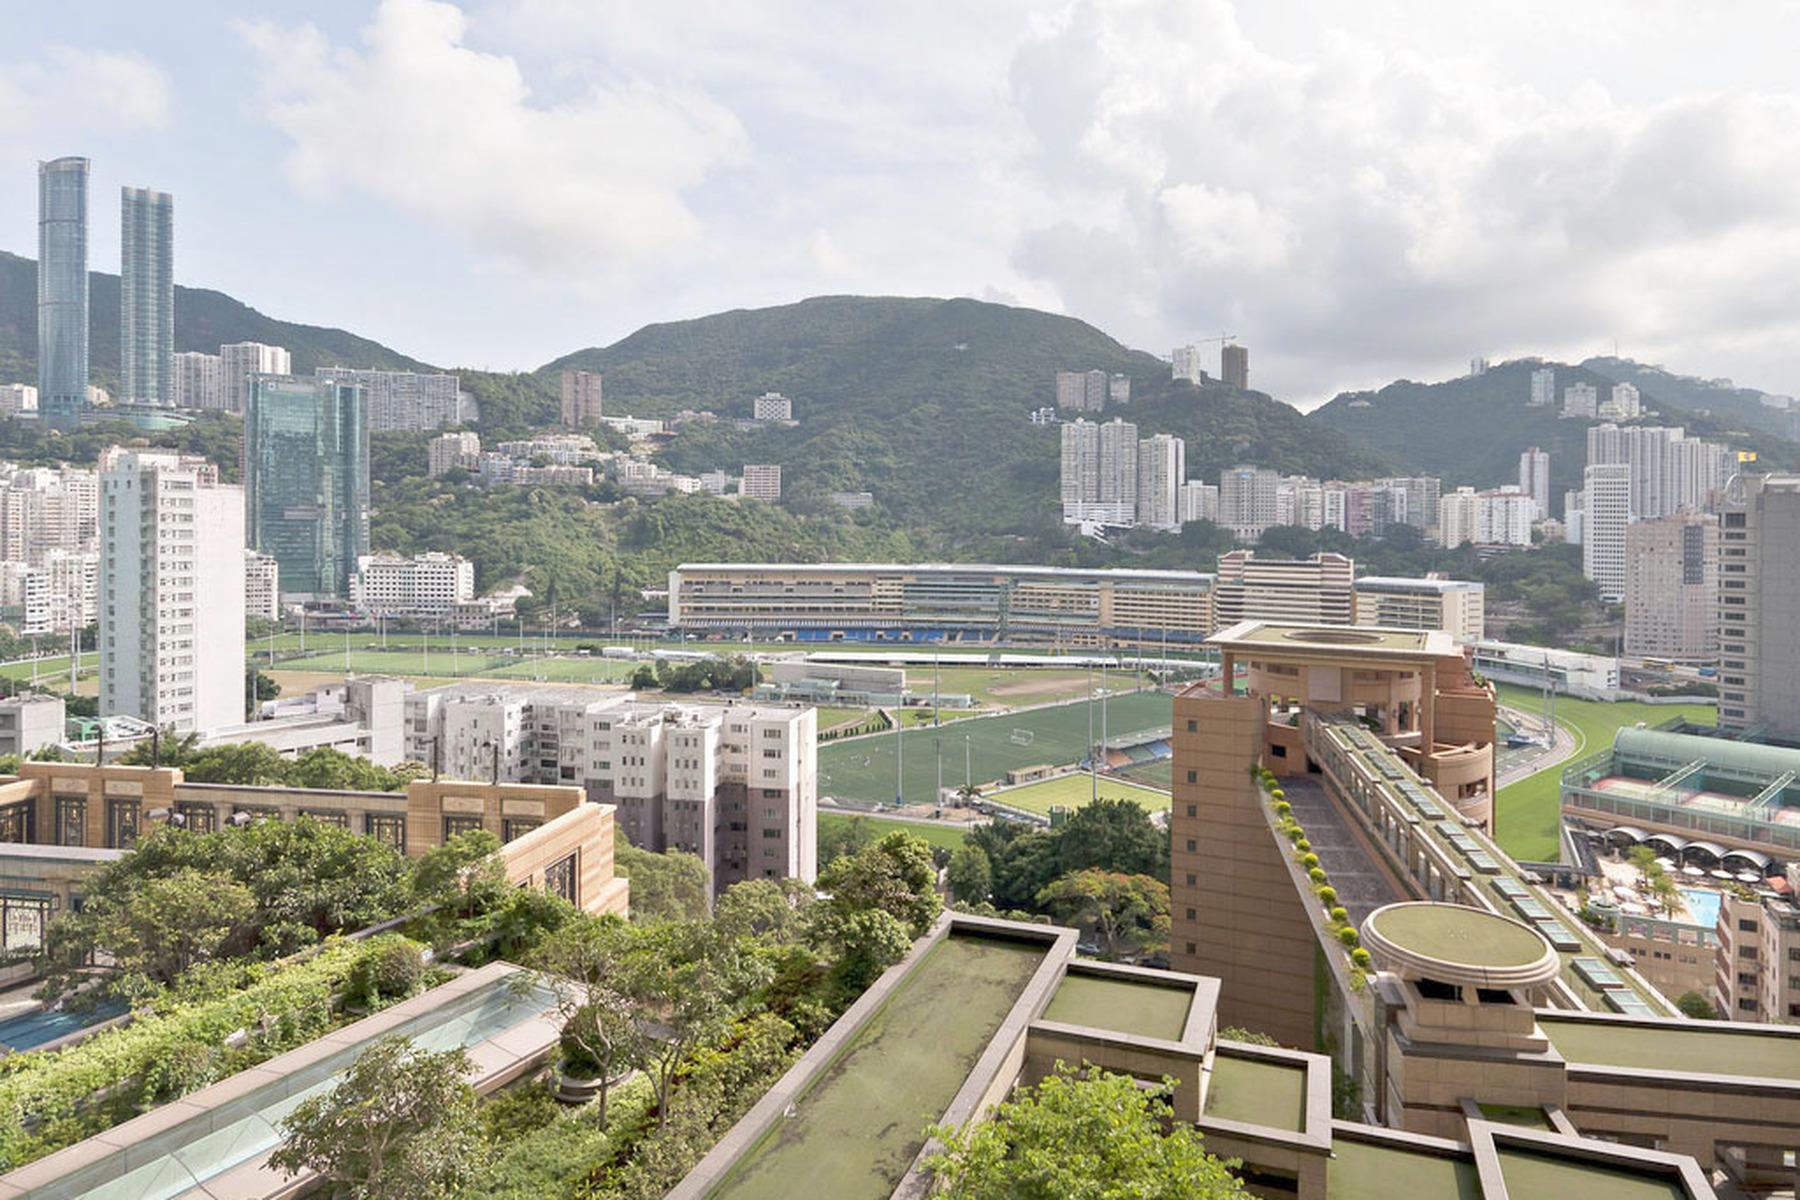 Квартира для того Продажа на The Leighton Hill - Block 05 Happy Valley, Гонконг